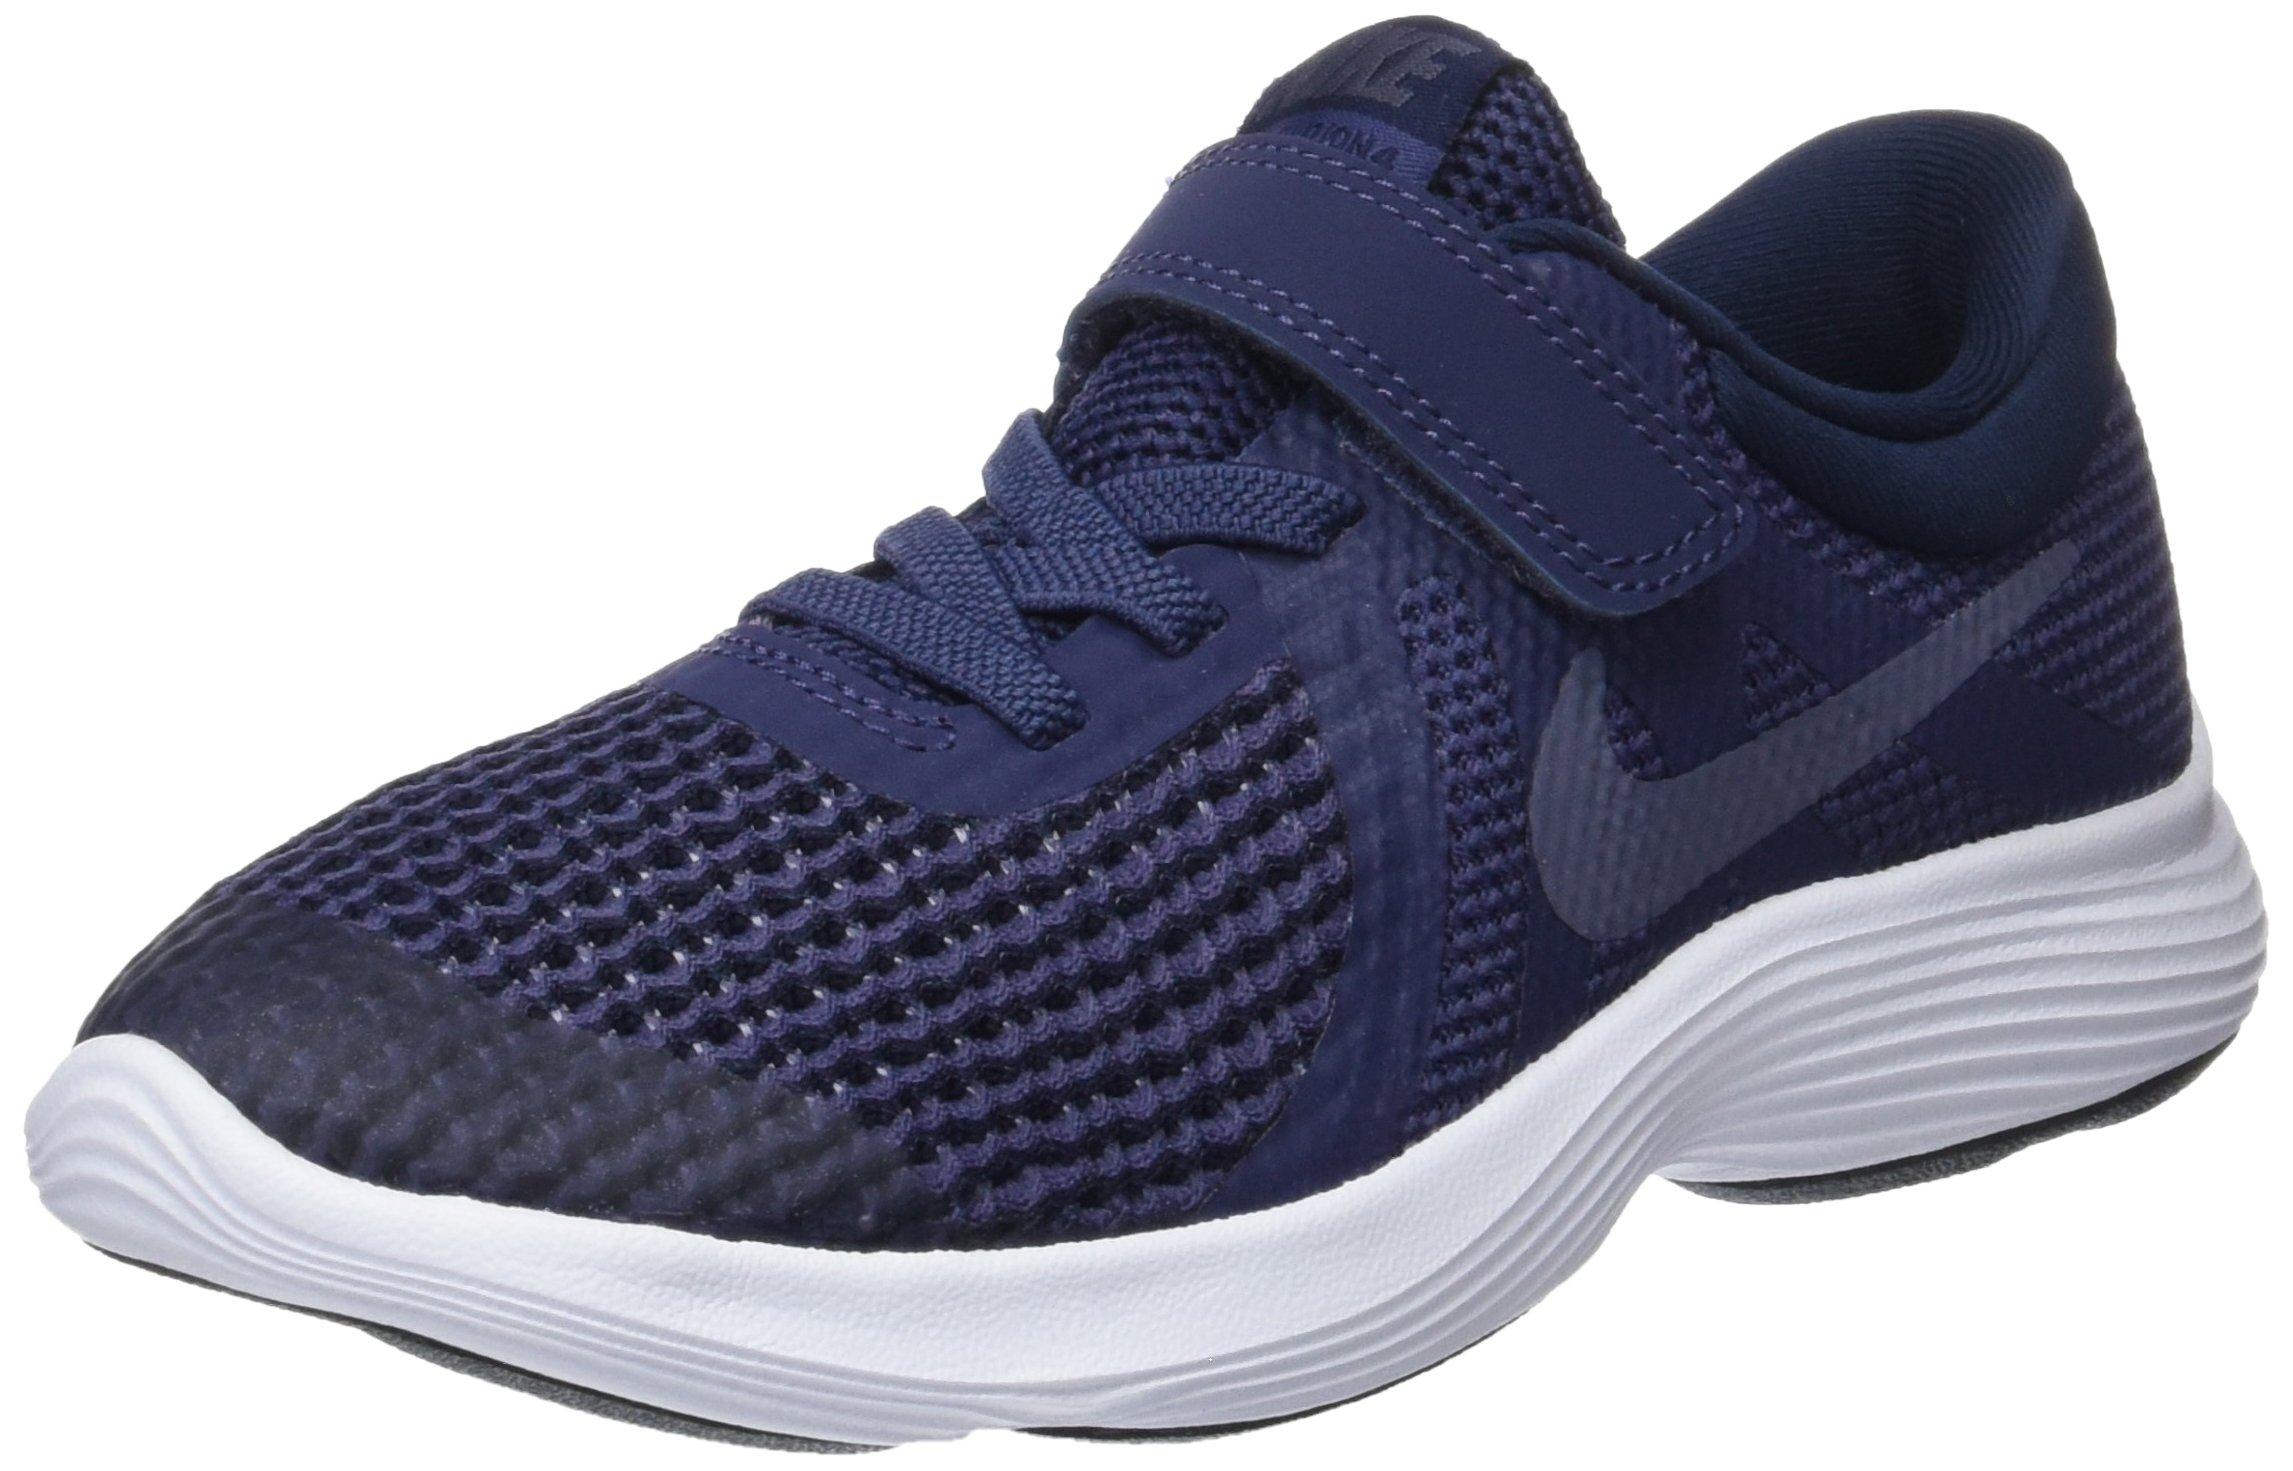 Nike Boys' Revolution 4 (PSV) Running Shoe, Neutral Indigo/Light Carbon-Obsidian, 10.5C Regular US Little Kid by Nike